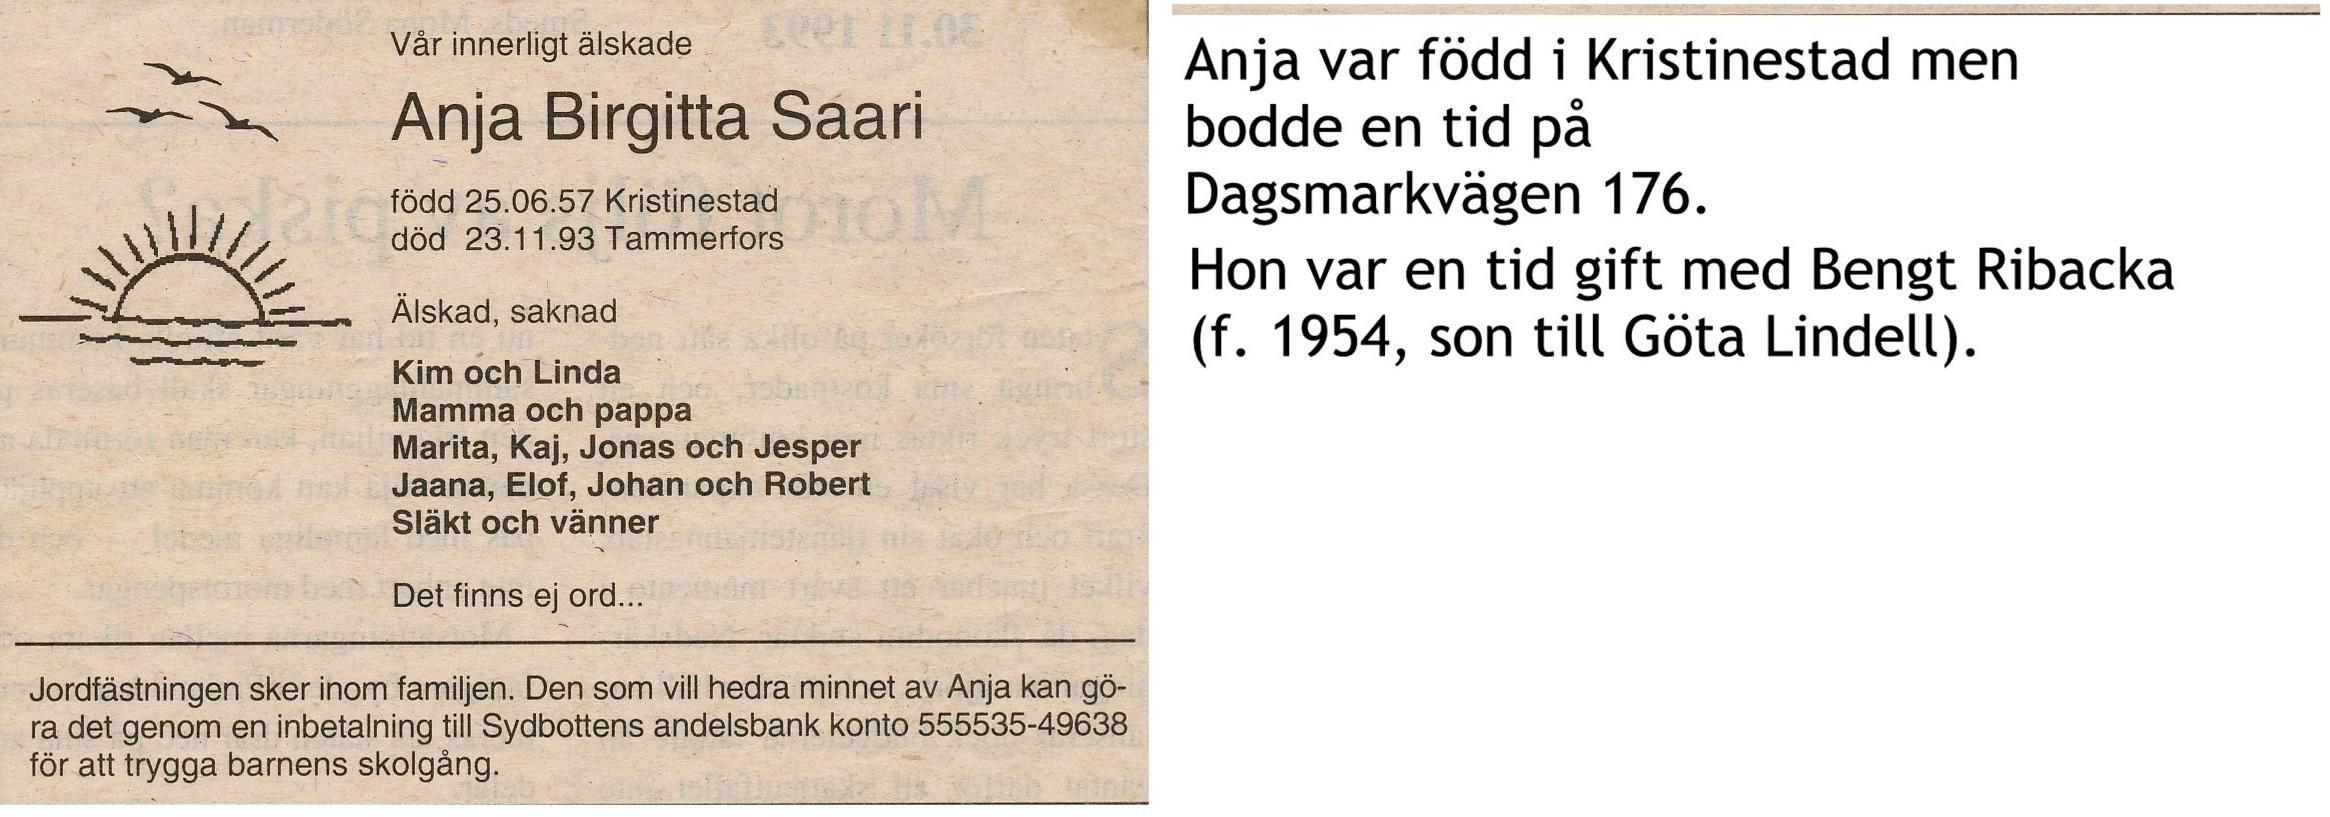 Saari Anja